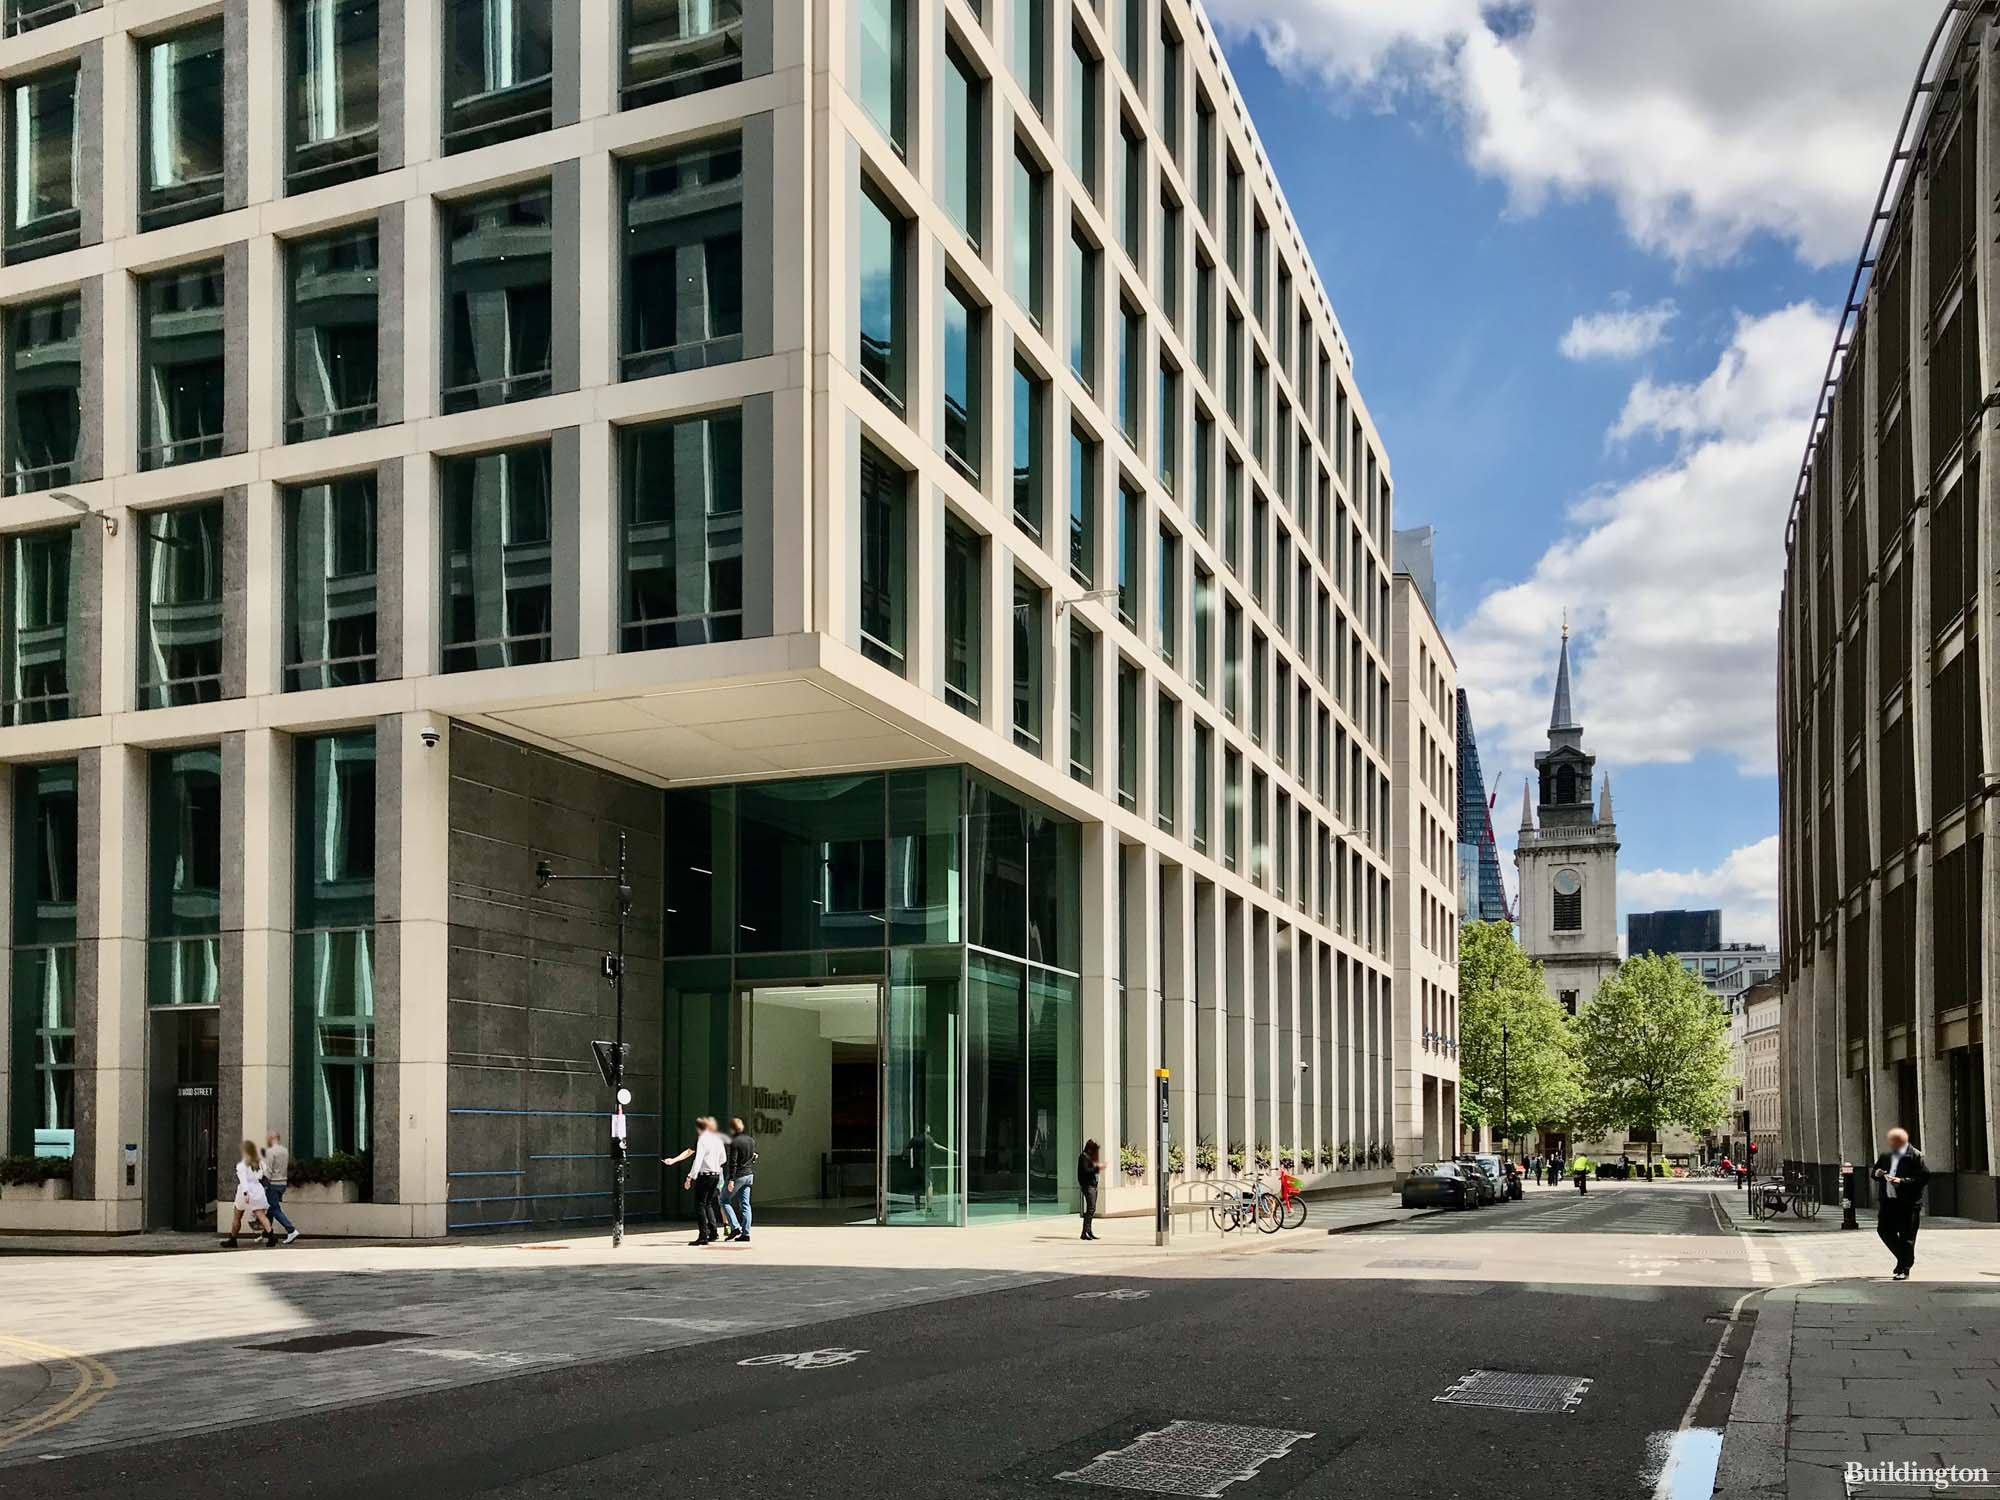 55 Gresham Street building designed by Fletcher Priest Architects.